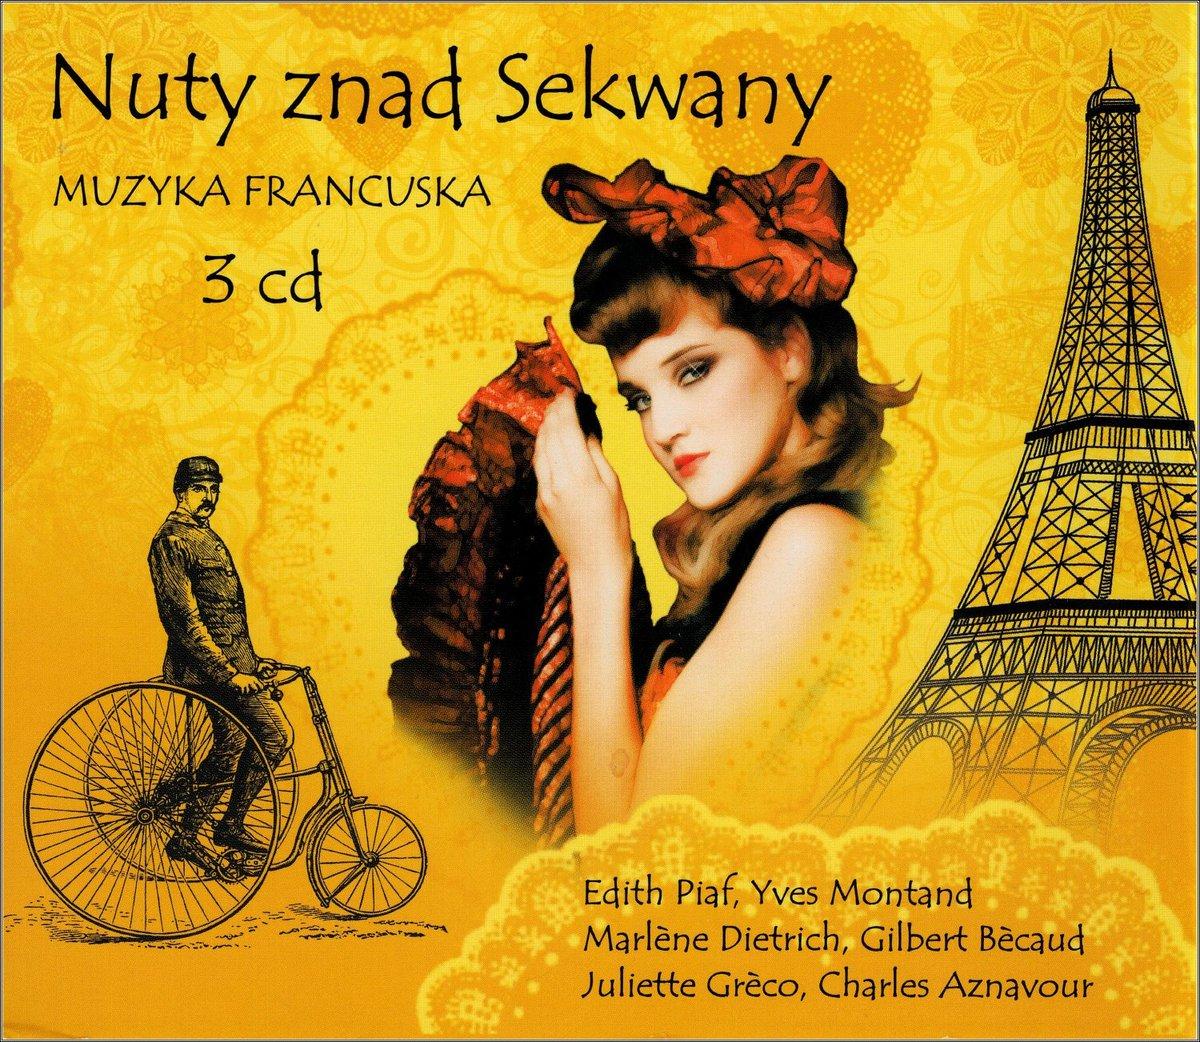 Nuty Znad Sekwany